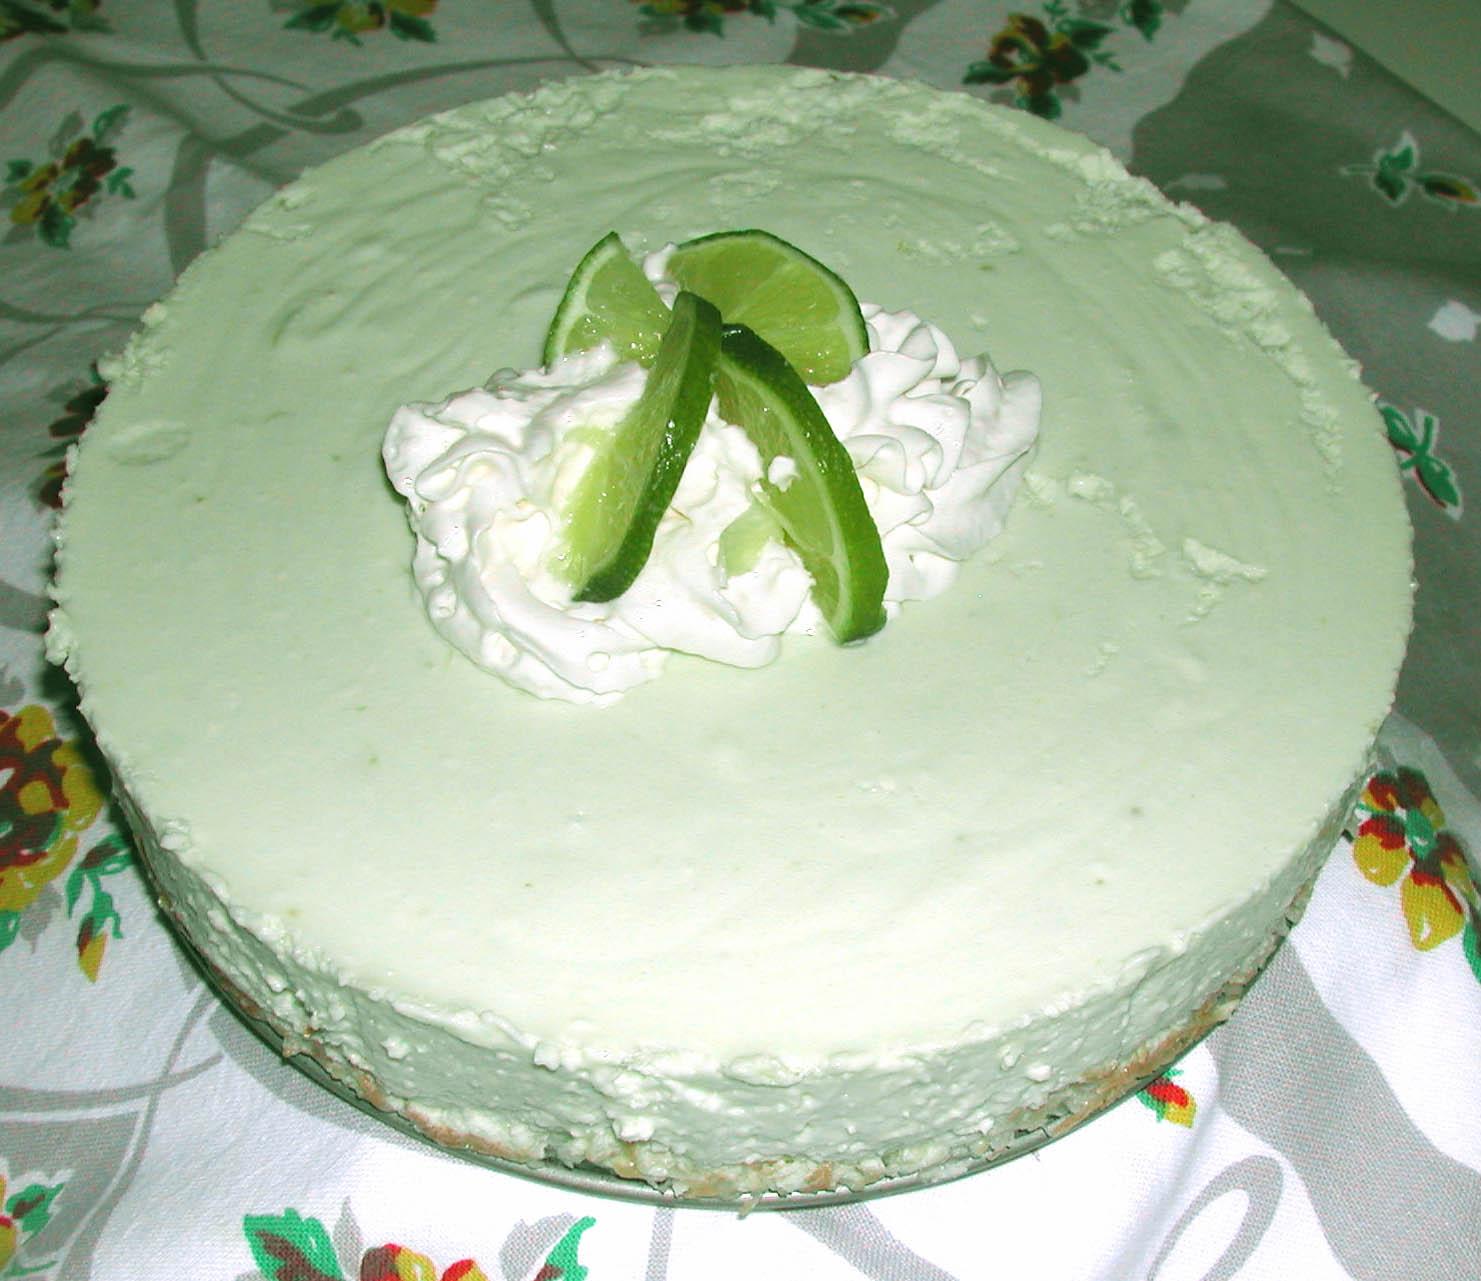 The Iowa Housewife: Family Favorites - Tropical Cheesecake